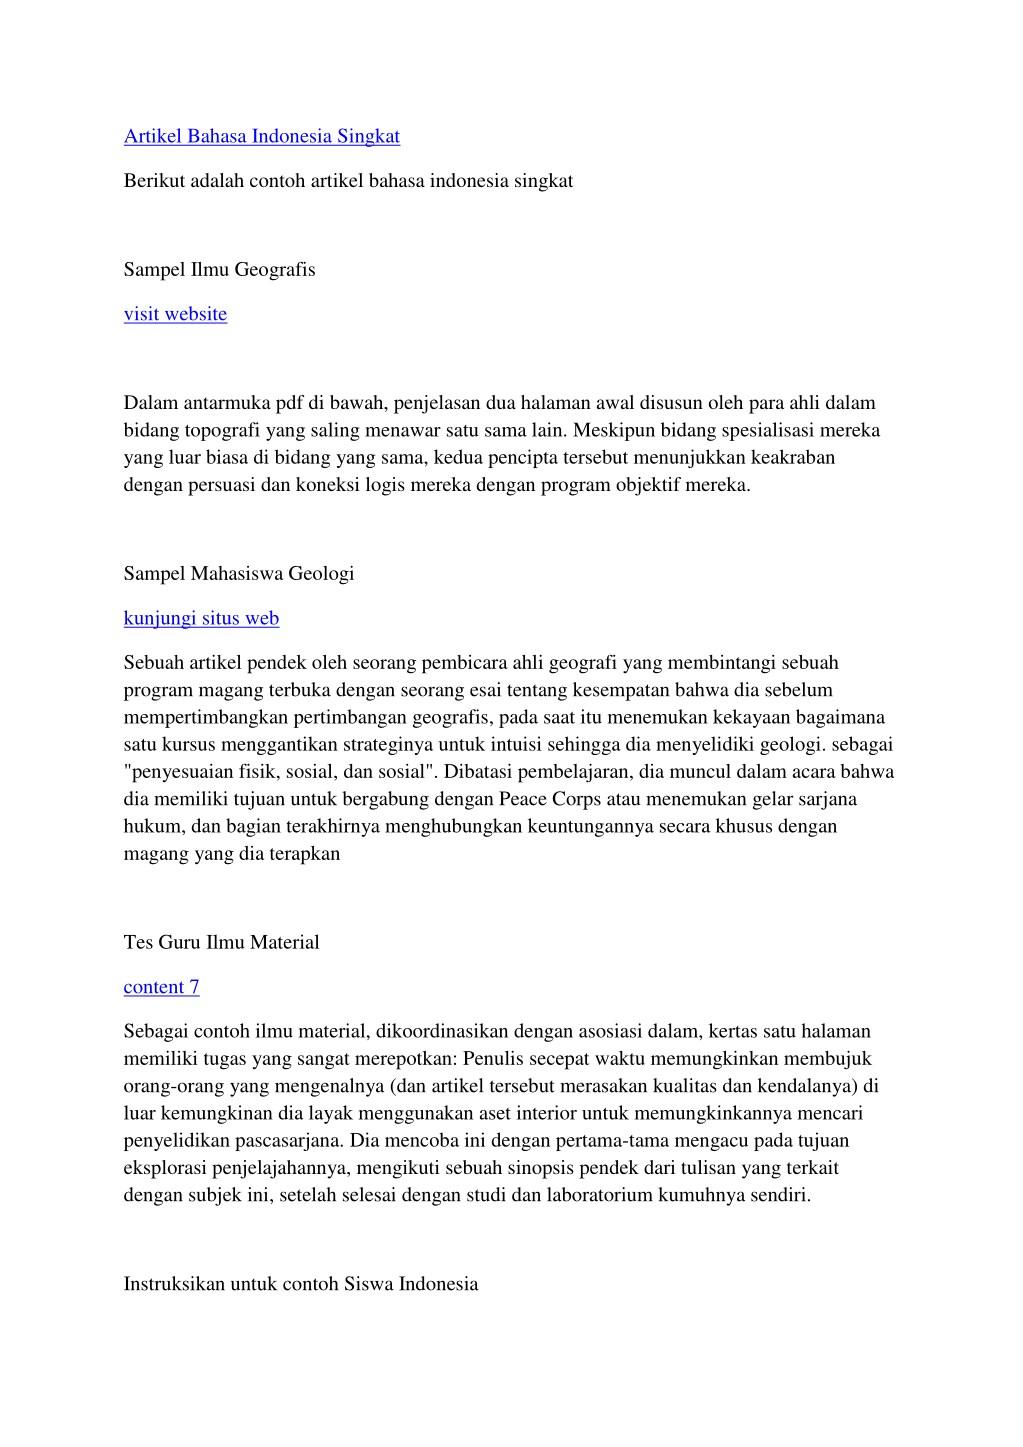 Ppt Artikel Bahasa Indonesia Singkat Powerpoint Presentation Id